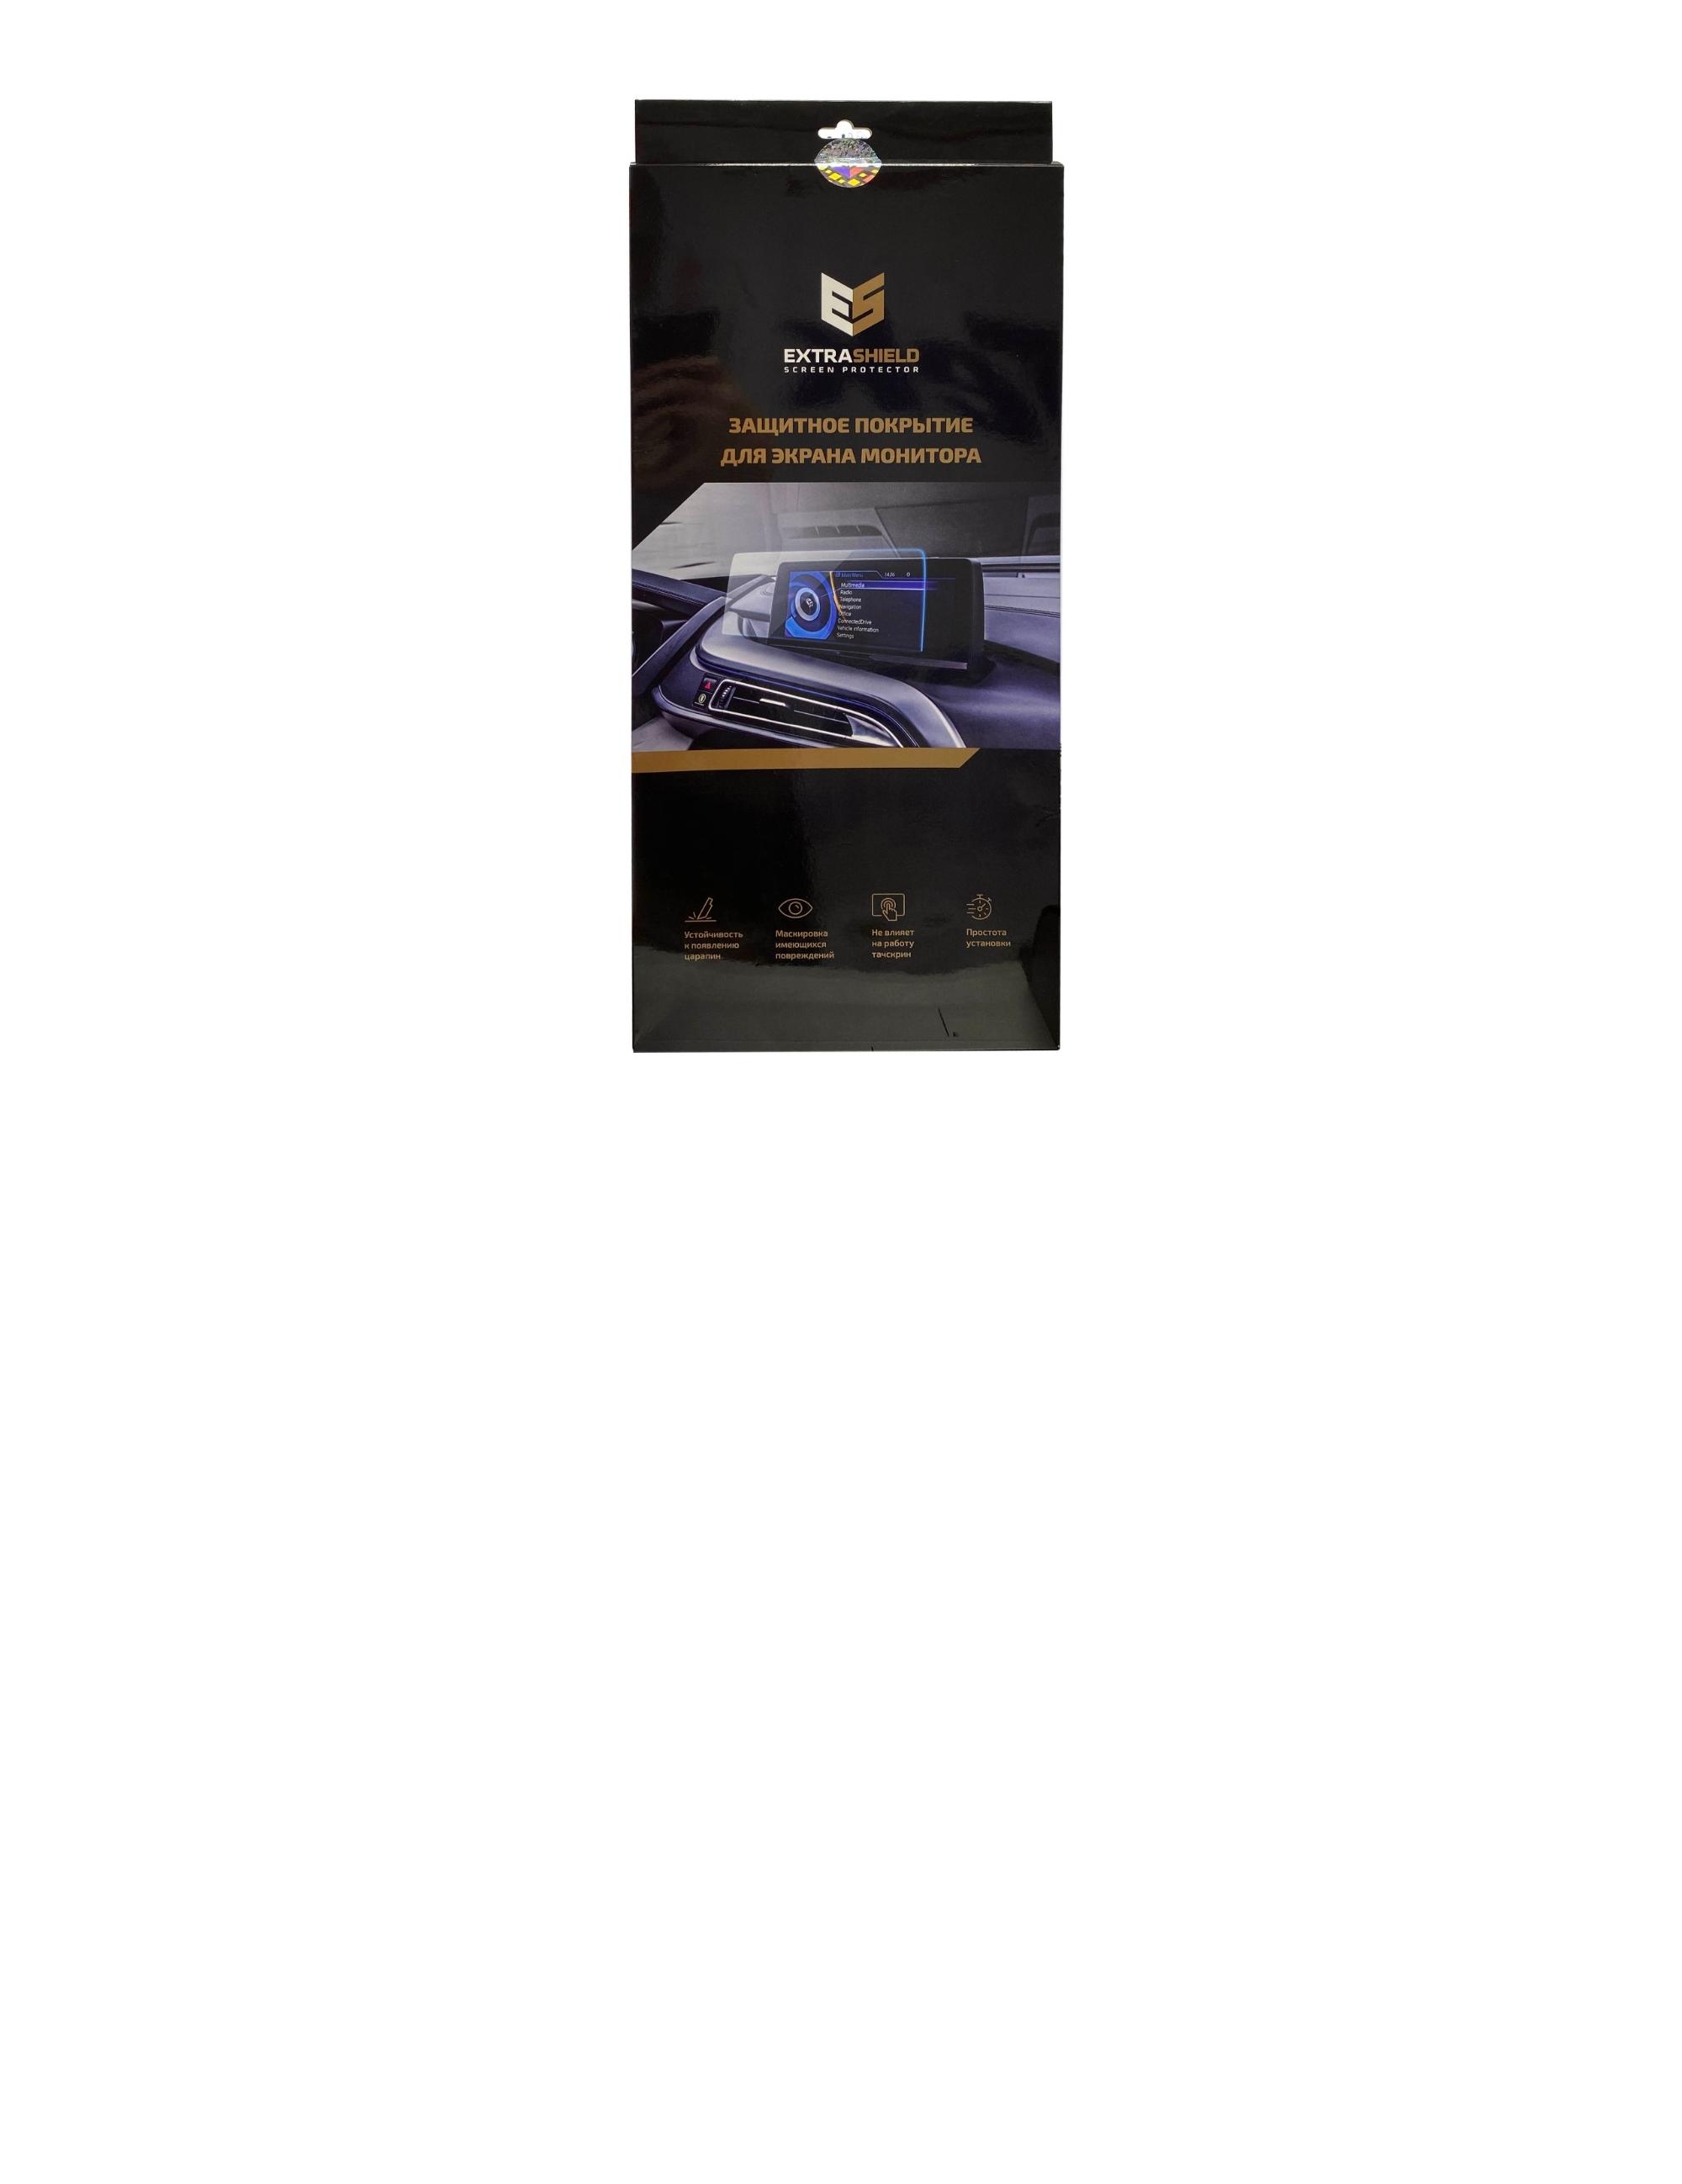 Porsche Cayenne 2017 - н.в. мультимедиа 12.3 Защитное стекло Матовая